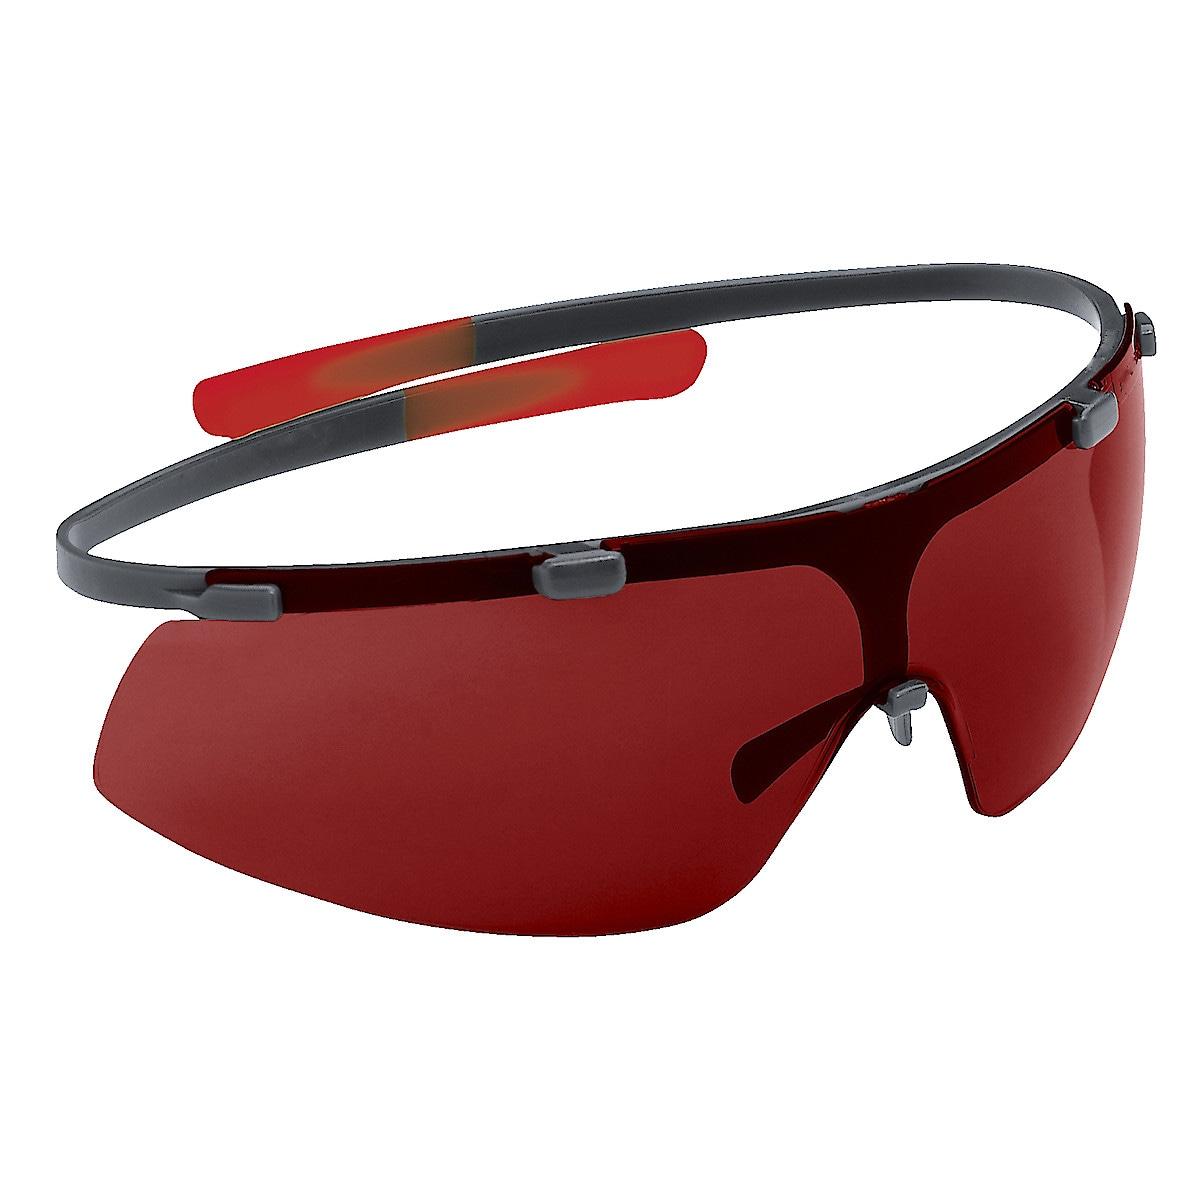 Leica Disto GLB30 laserbriller